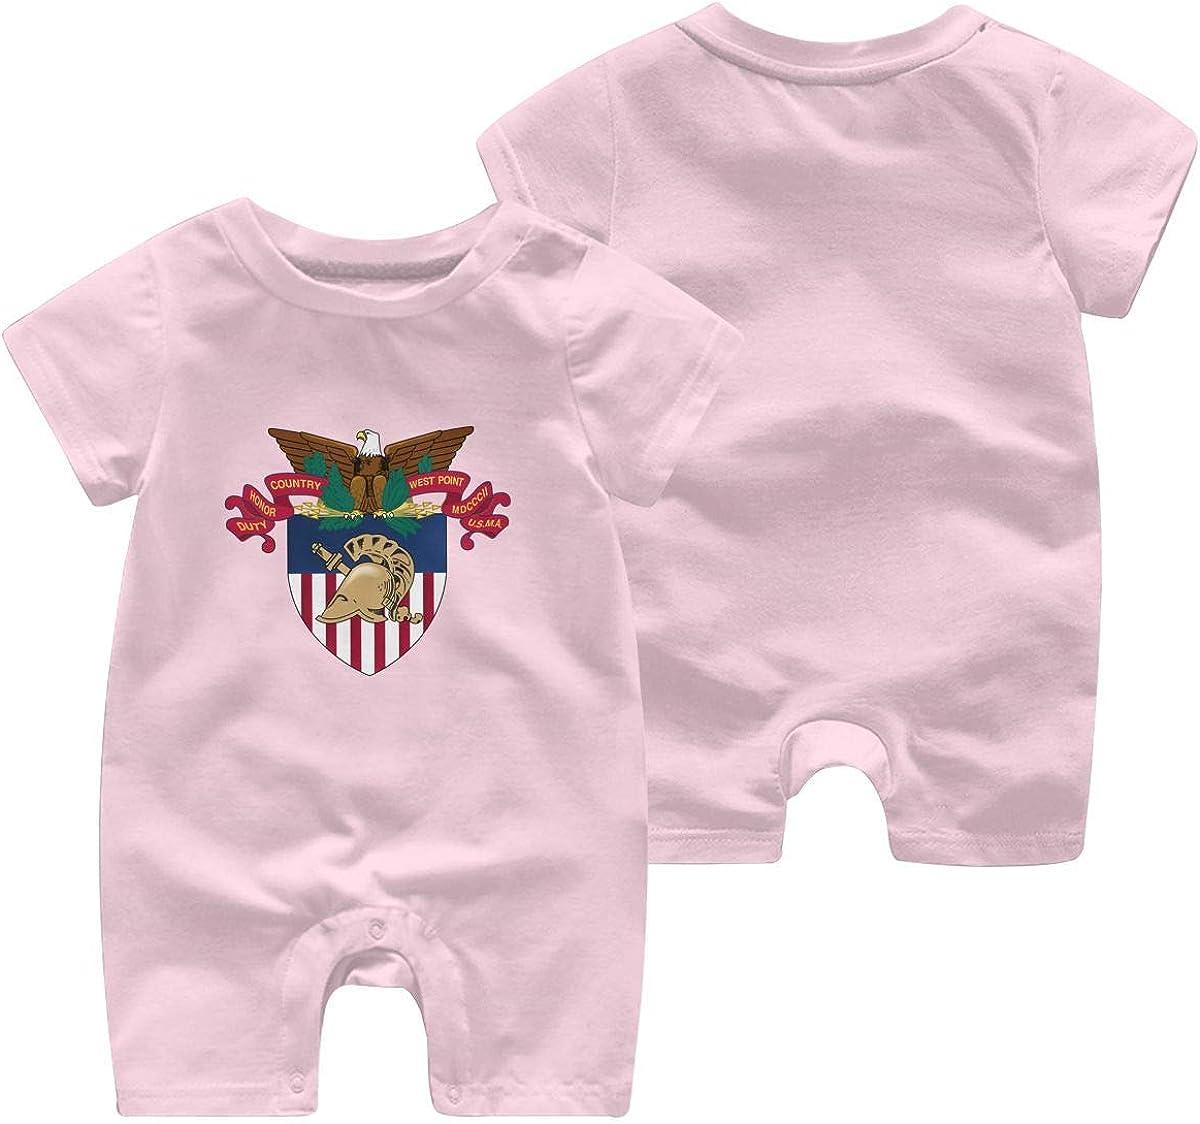 Xiaolizi Romper West Point Military Academy Jumpsuit Short Sleeve Bodysuits Infant Funny Onesie Black